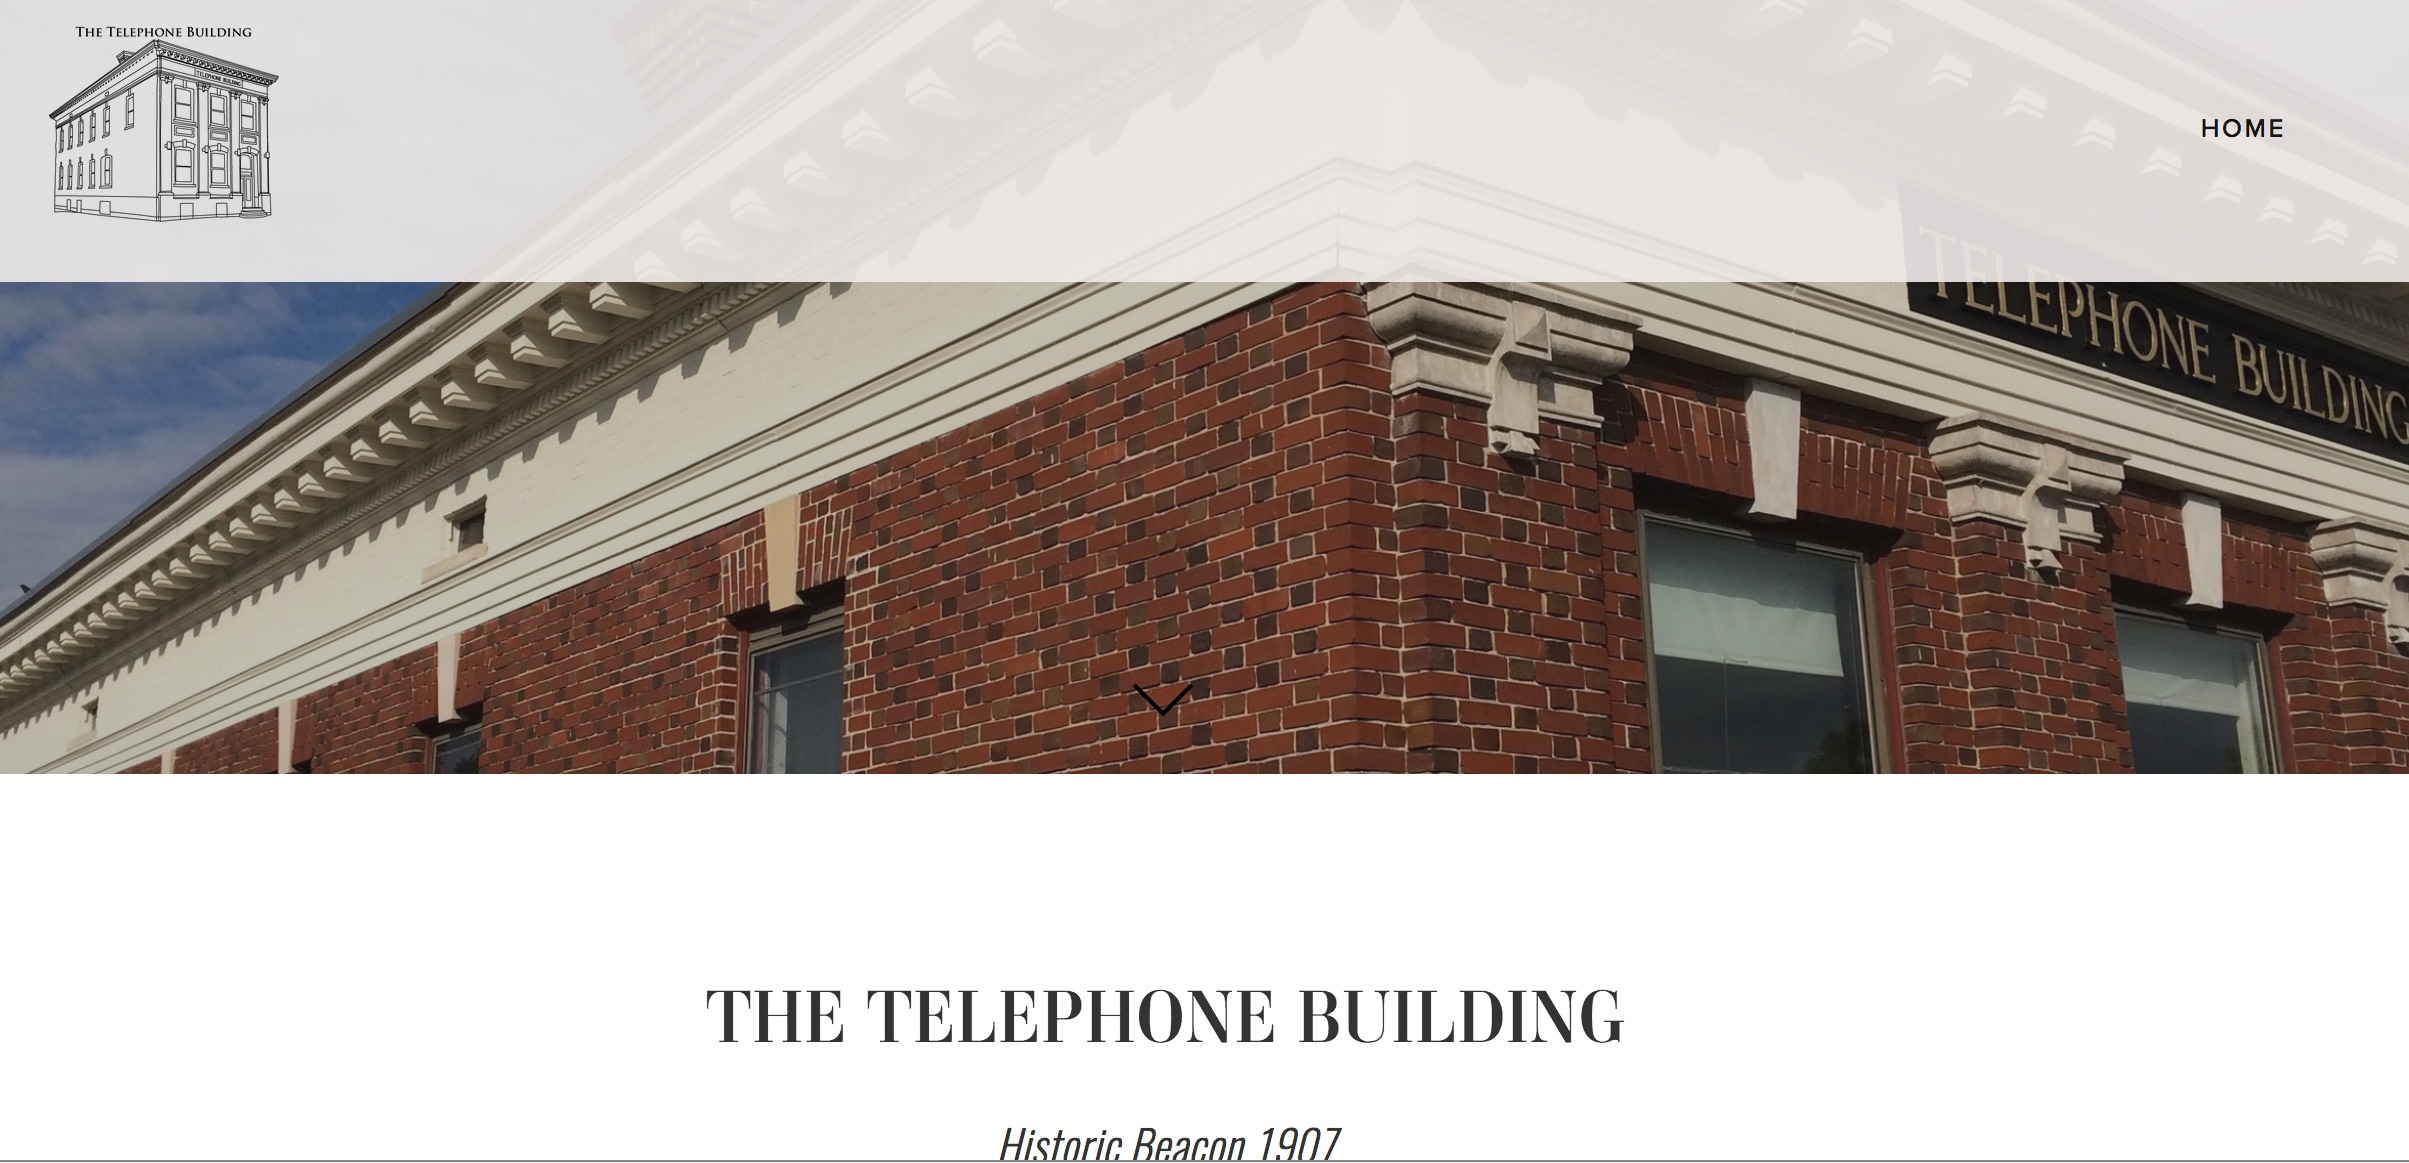 telephone building home.jpg